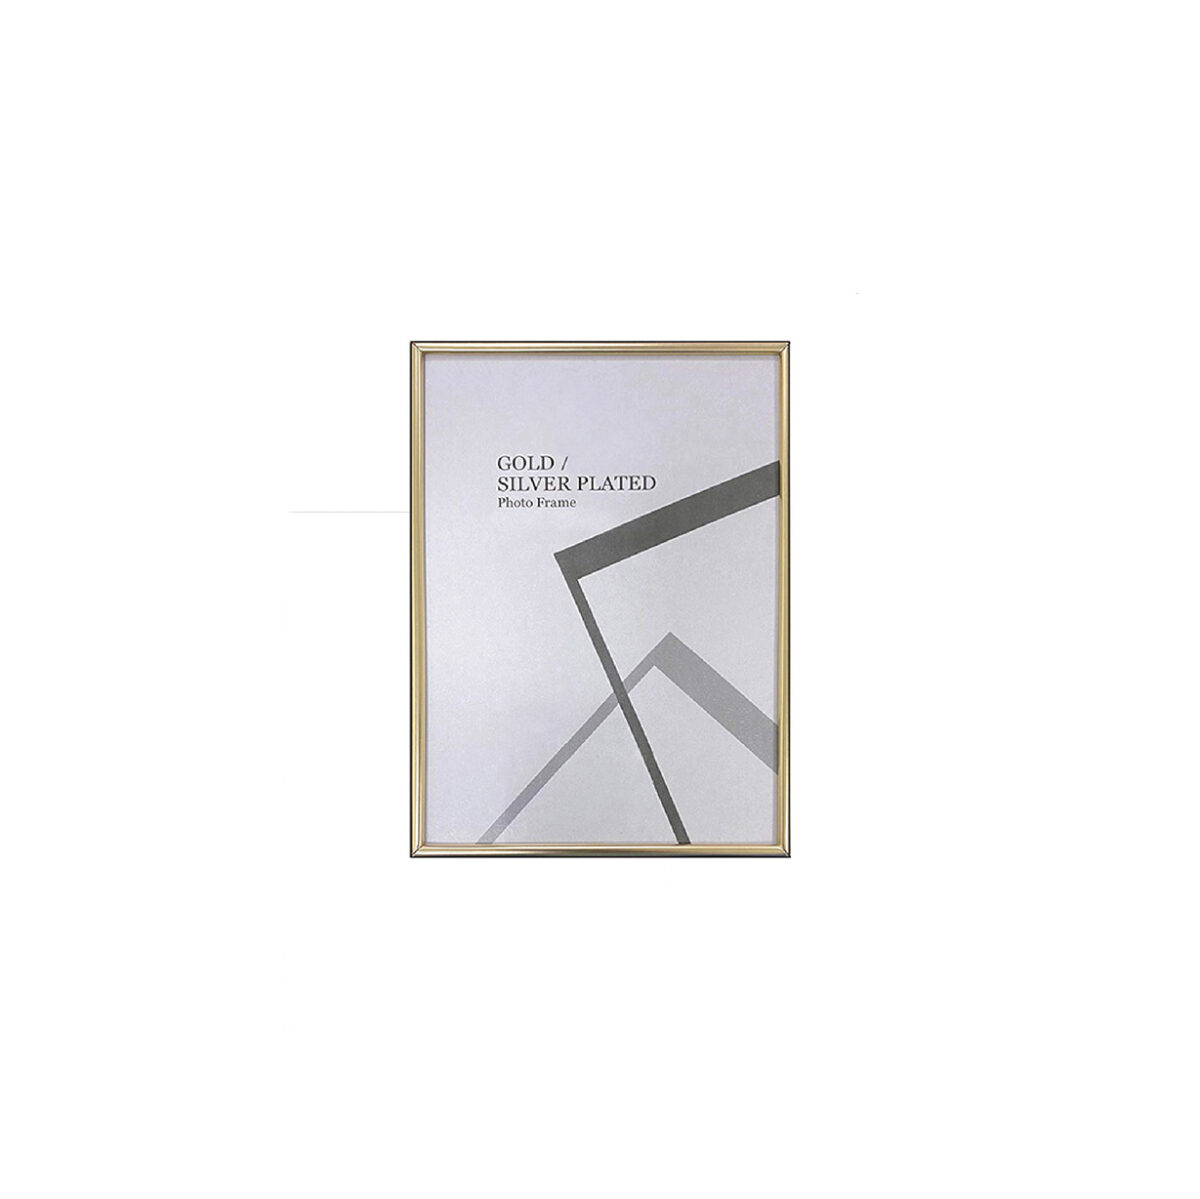 Centre Photo Frame / Picture Frame - Matte Gold 5R